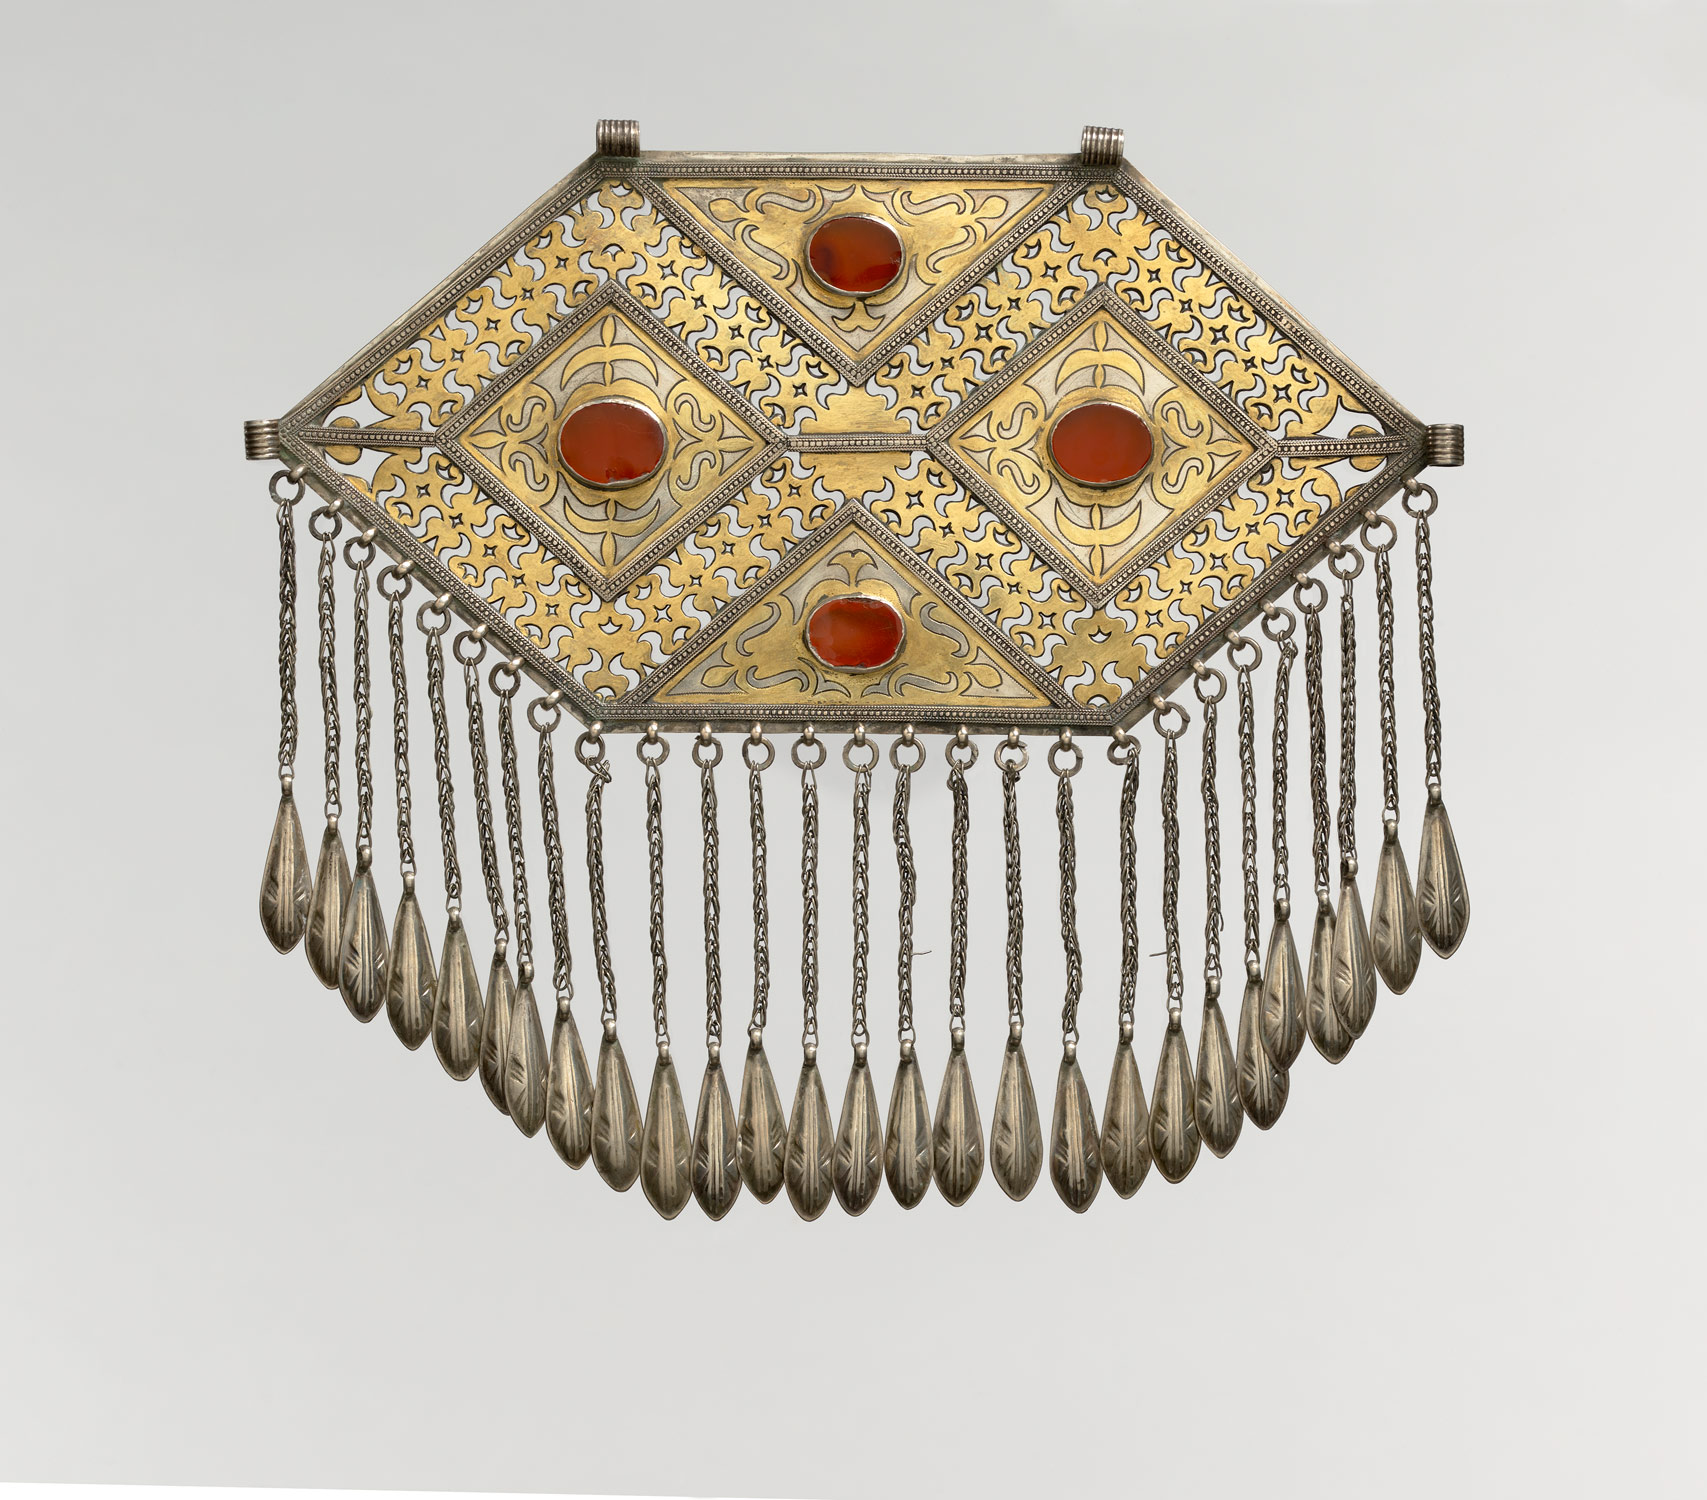 Pectoral ornament | Work of Art | Heilbrunn Timeline of Art